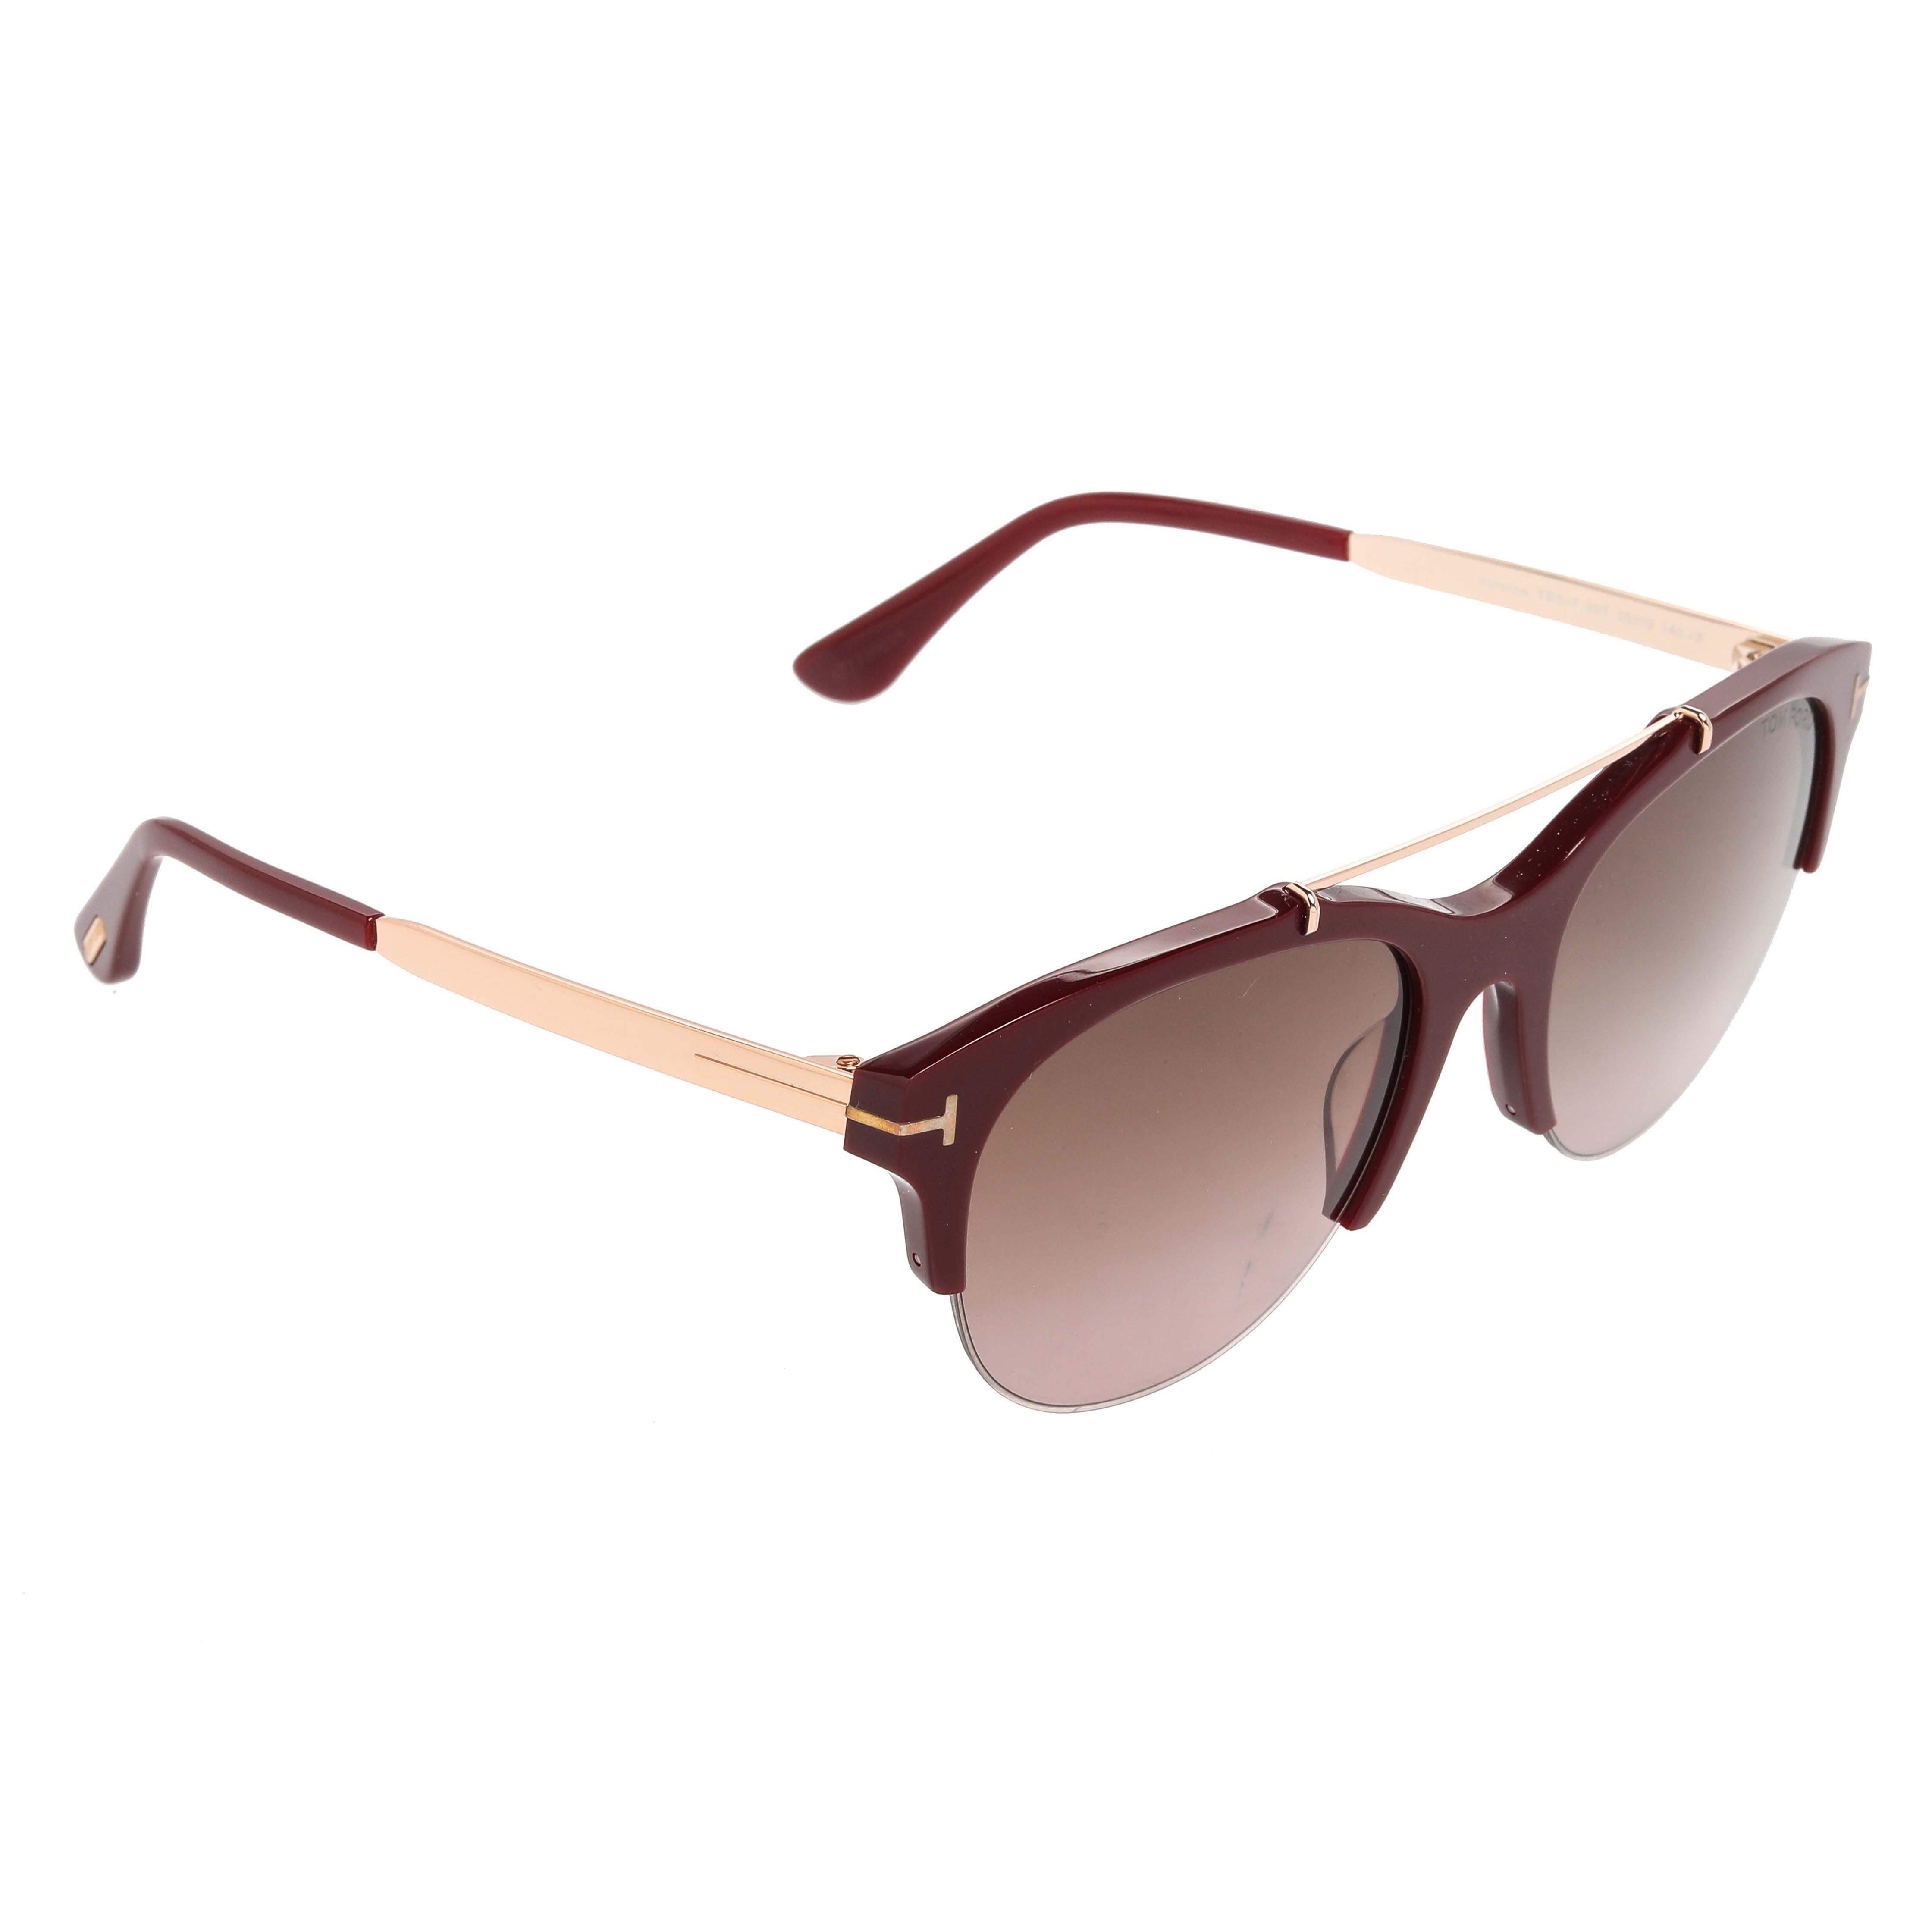 Tom Ford Maroon/Grey Gradient Adrenne Semi Rimless Sunglasses